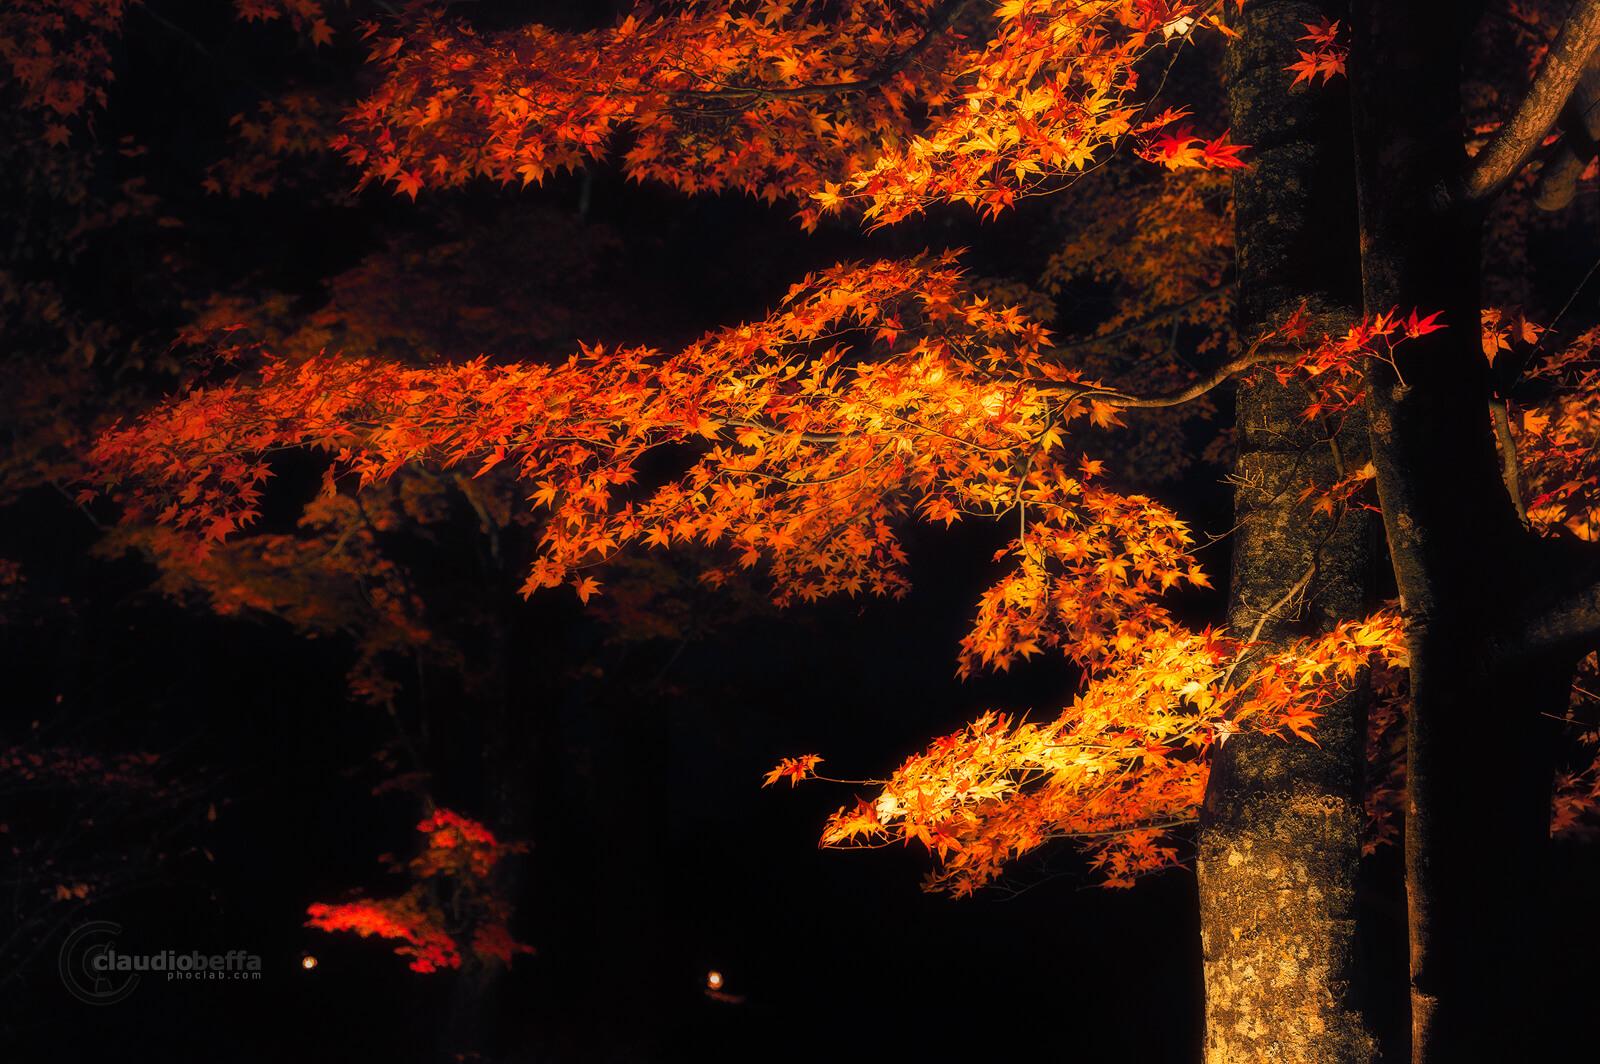 Mount Fuji, Fuji, autumn, fall, Momiji grove, red, leaves, trees, grove, light, darkness, travel, photography, phoclab